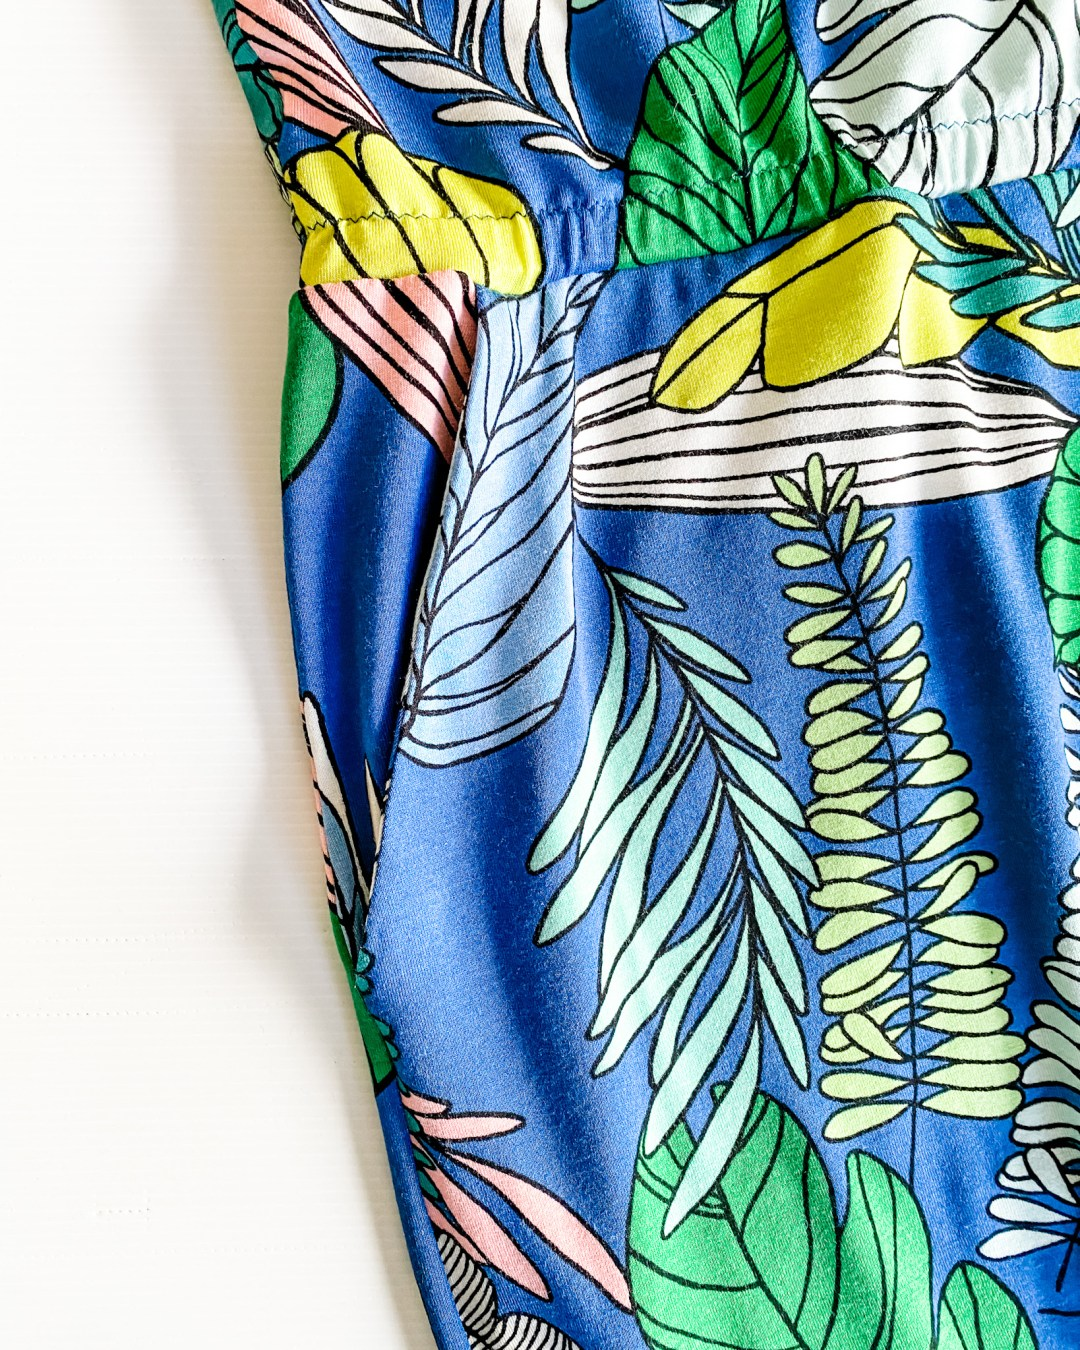 Cobalt viscose jersey fabric - close up of the pocket on the Closet Core Sallie Jumpsuit